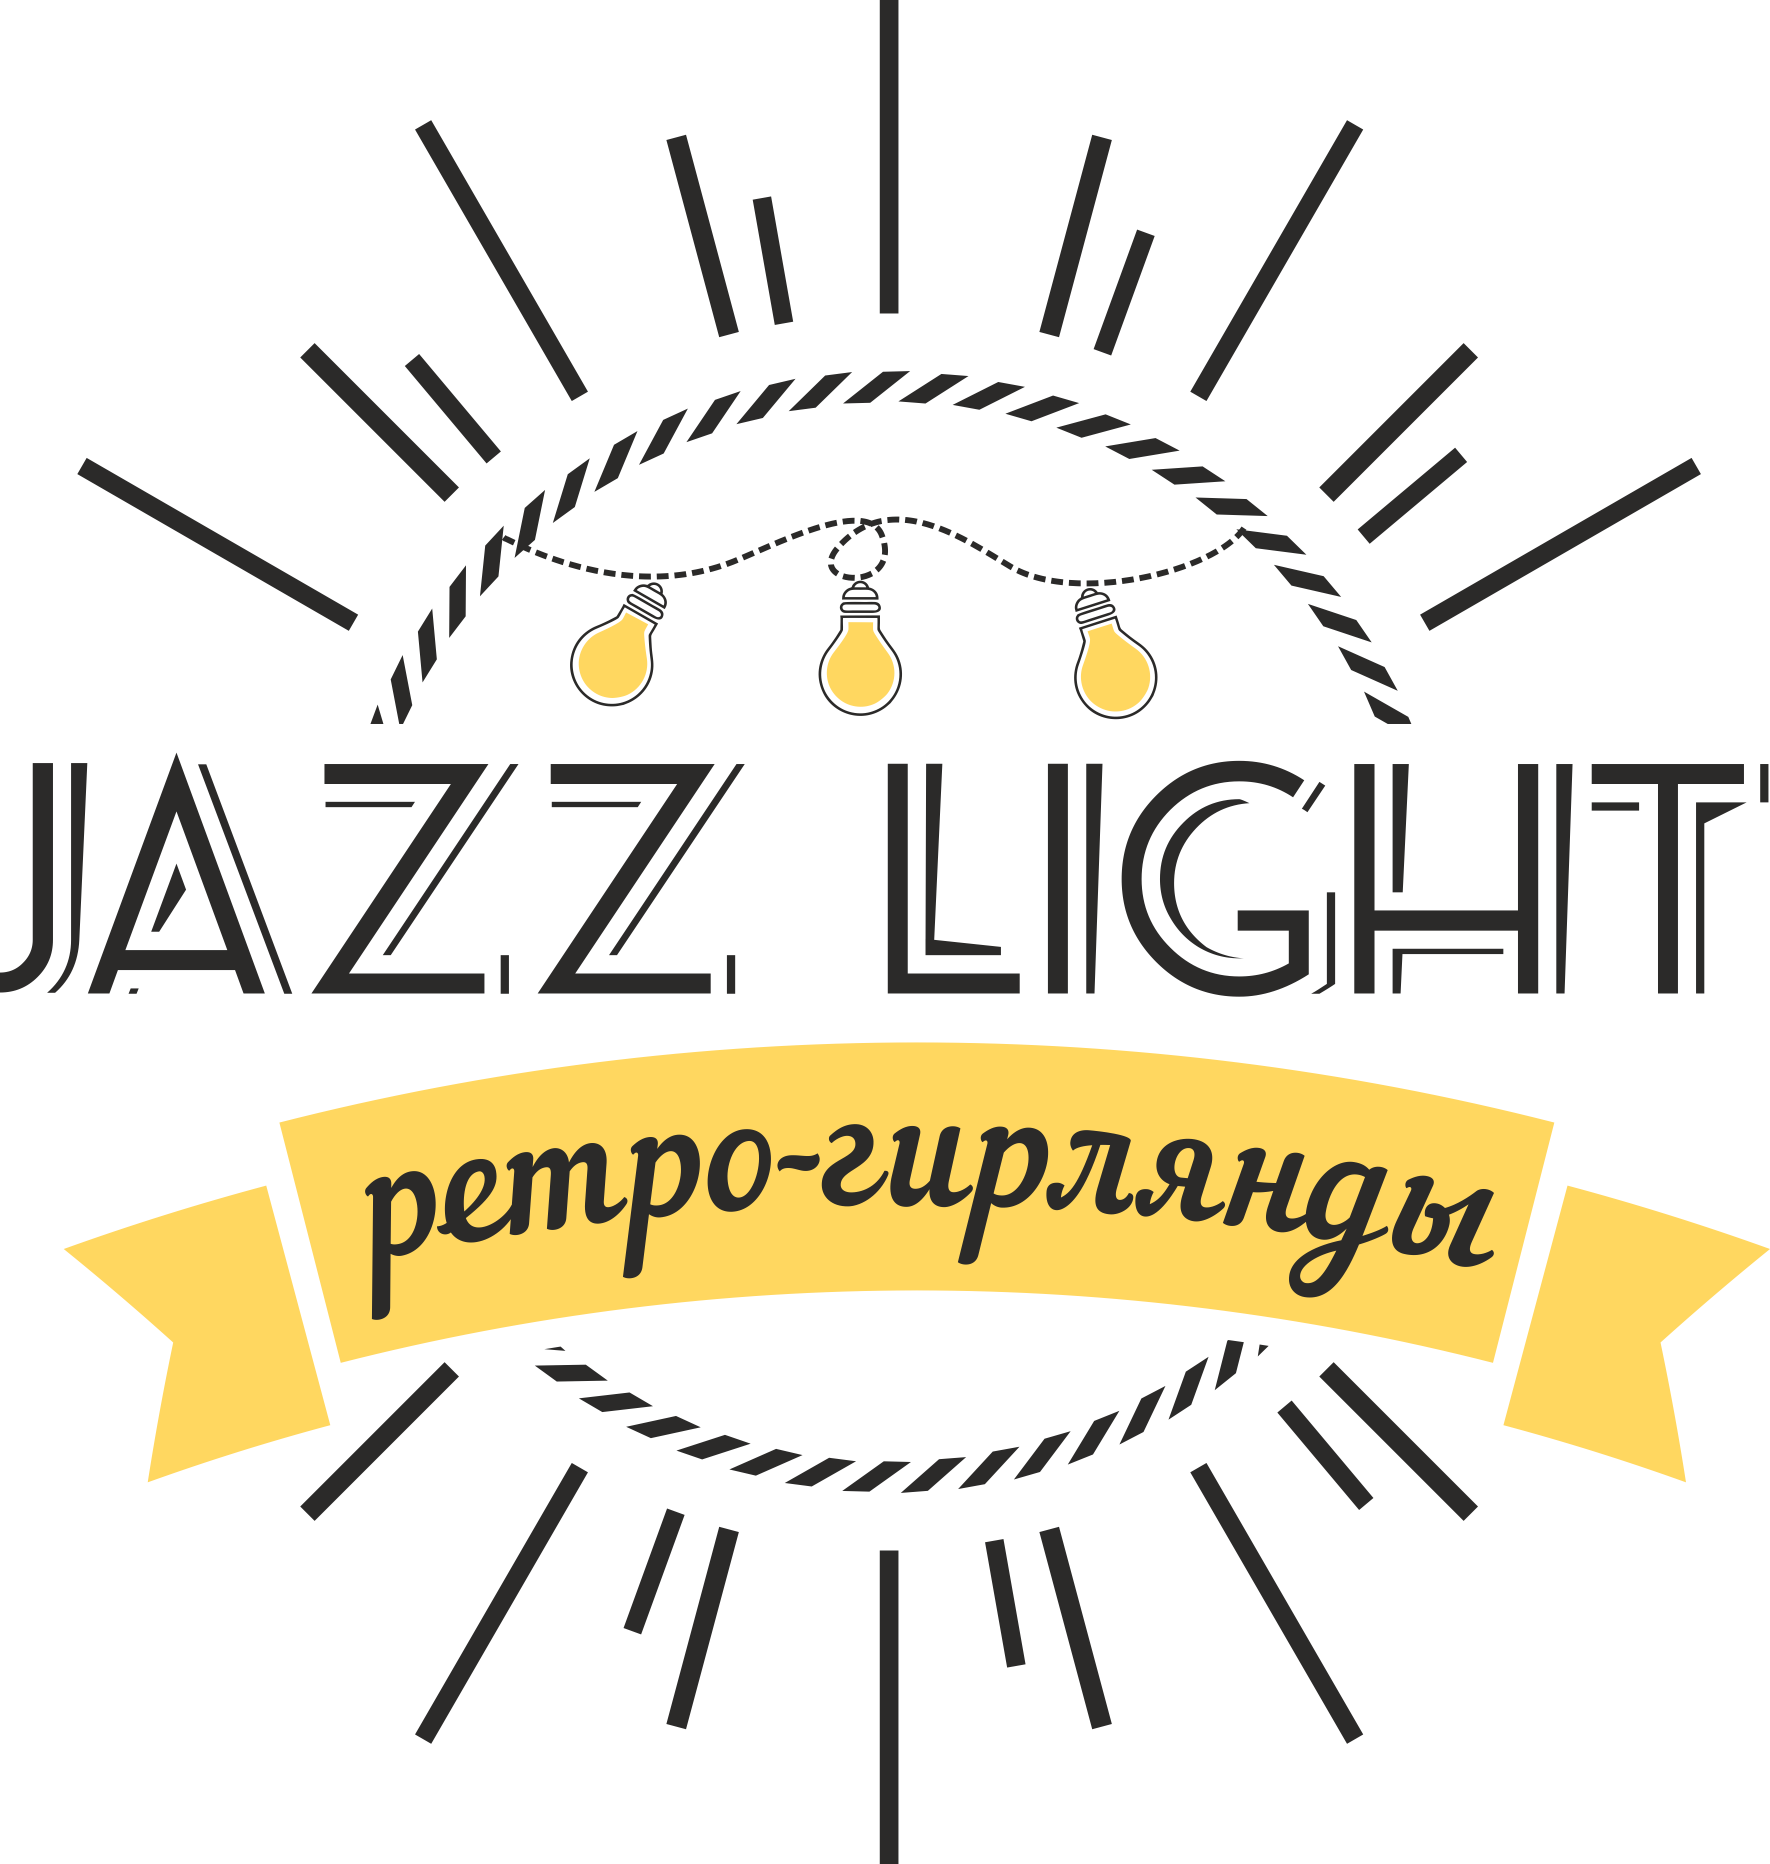 Jazz Light - ретро гирлянды и буквы с лампами